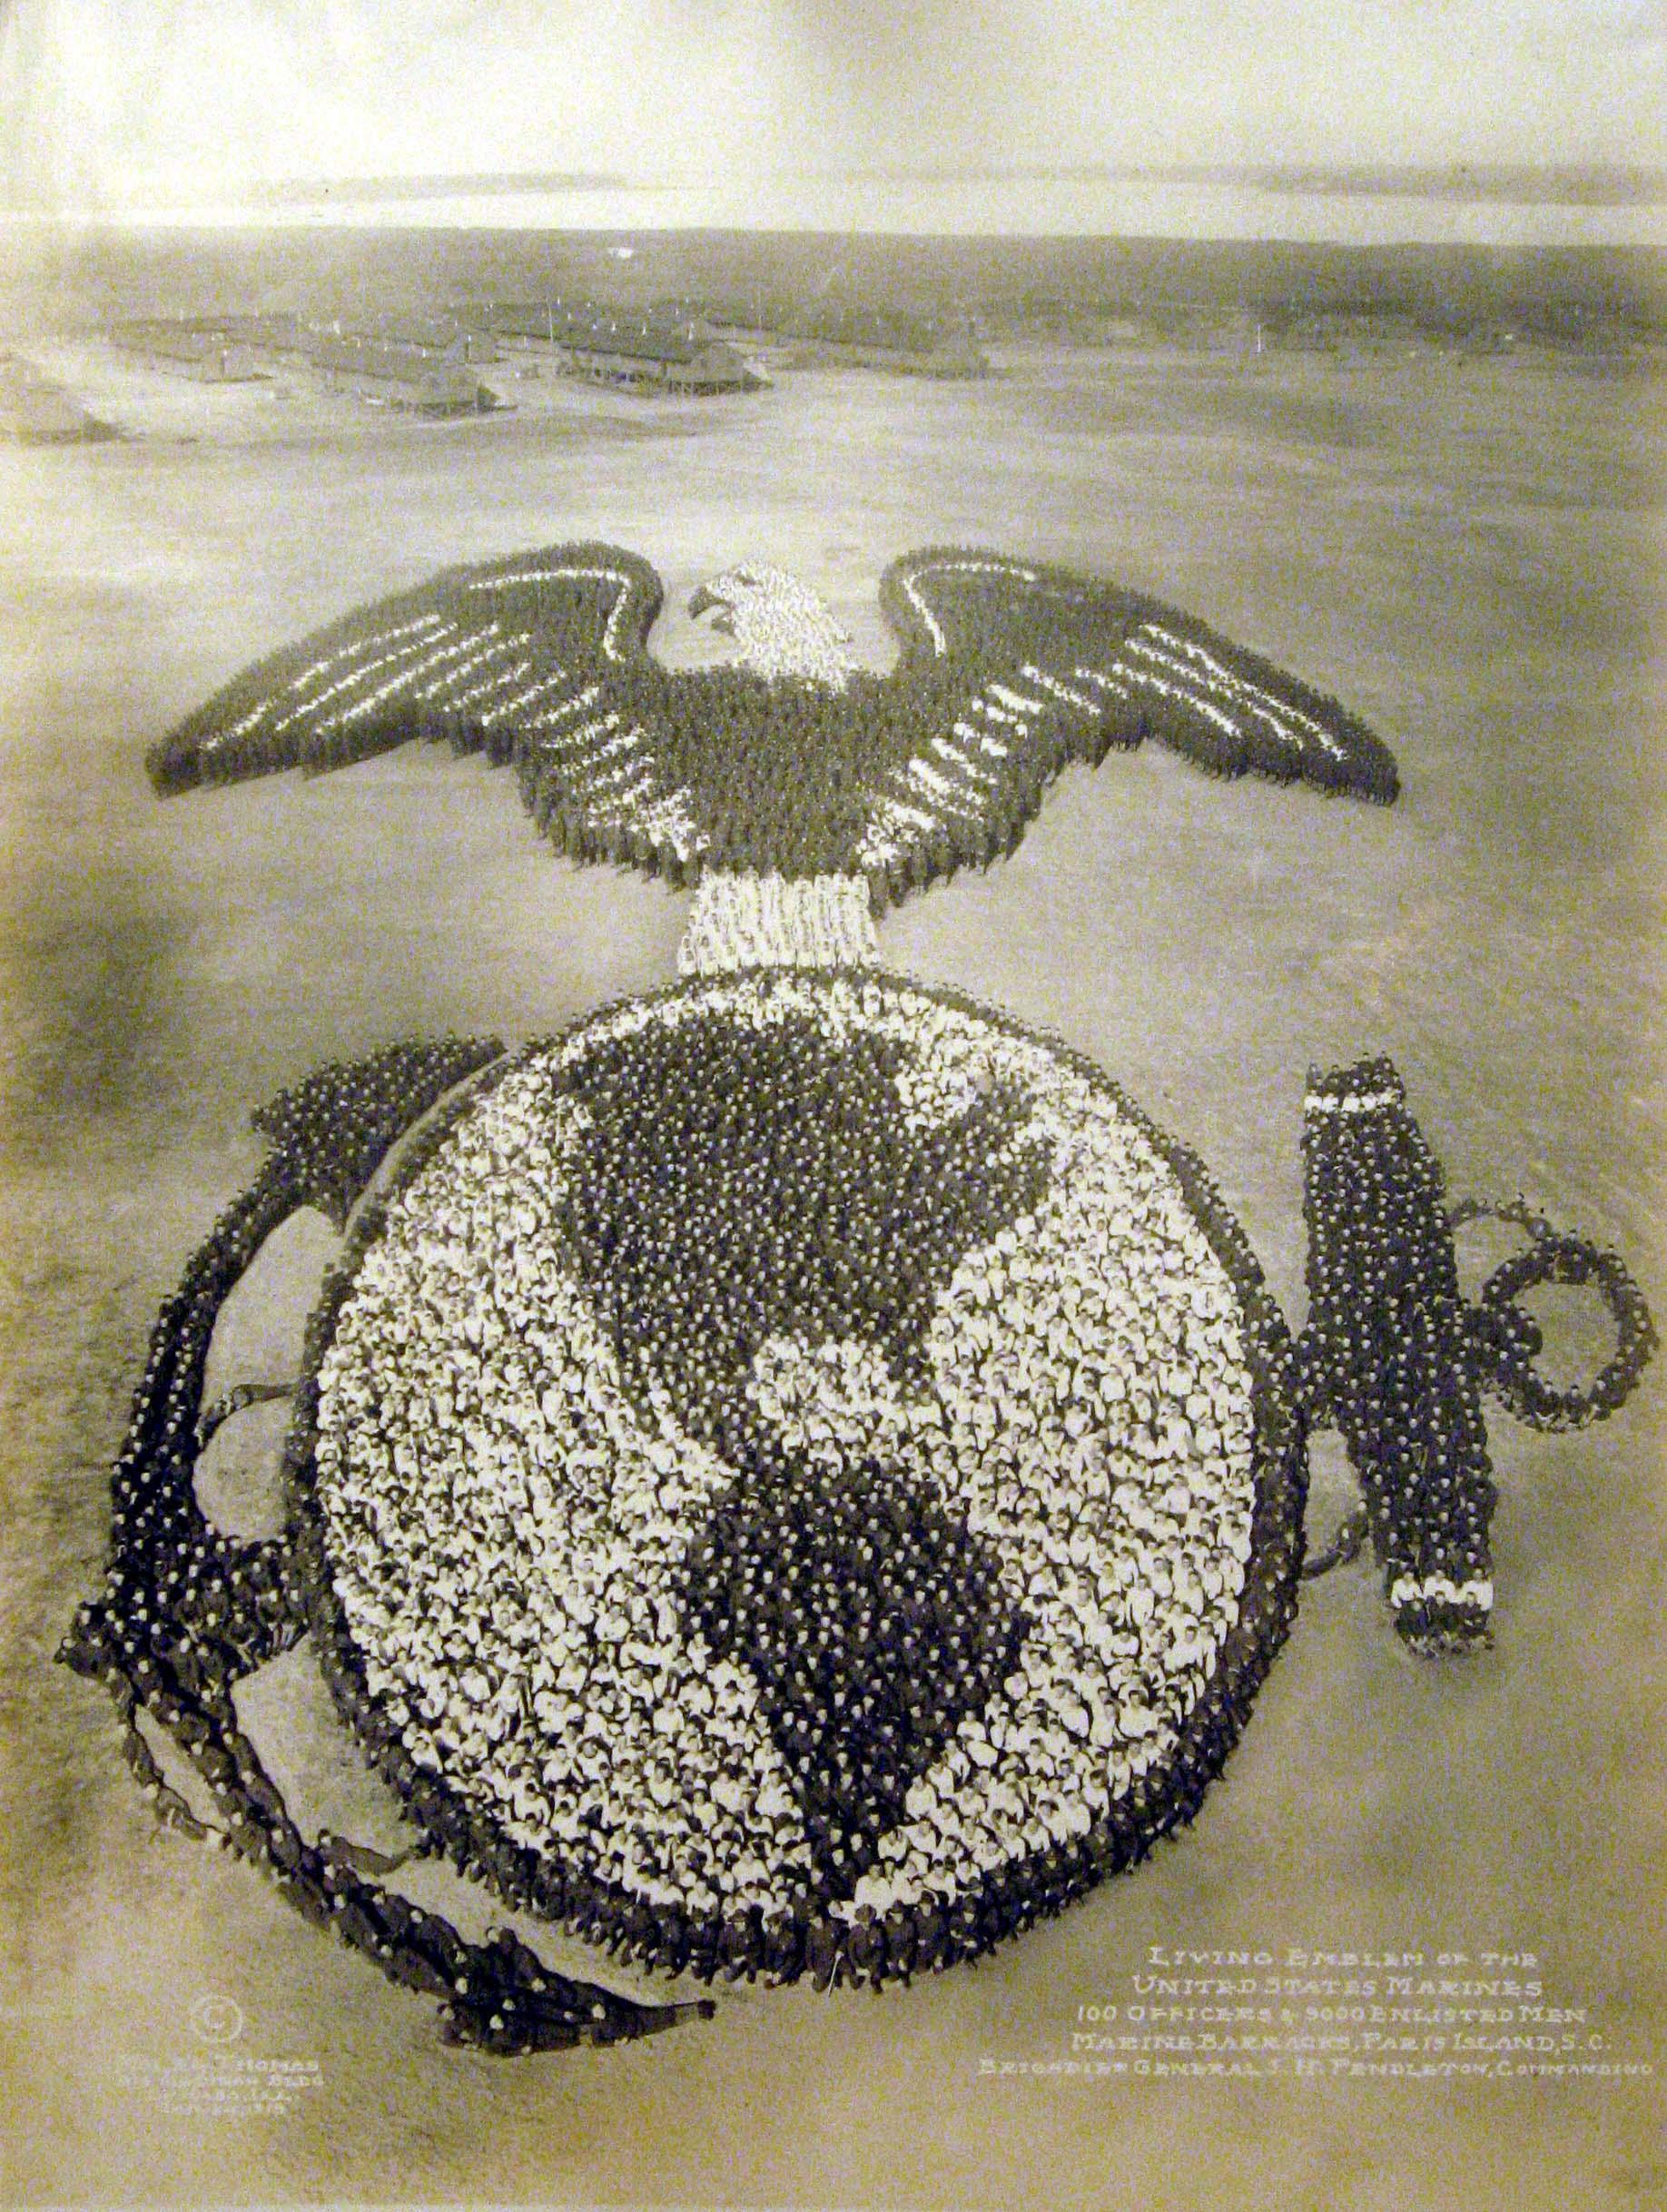 Living Emblem of the United States Marines, 1919